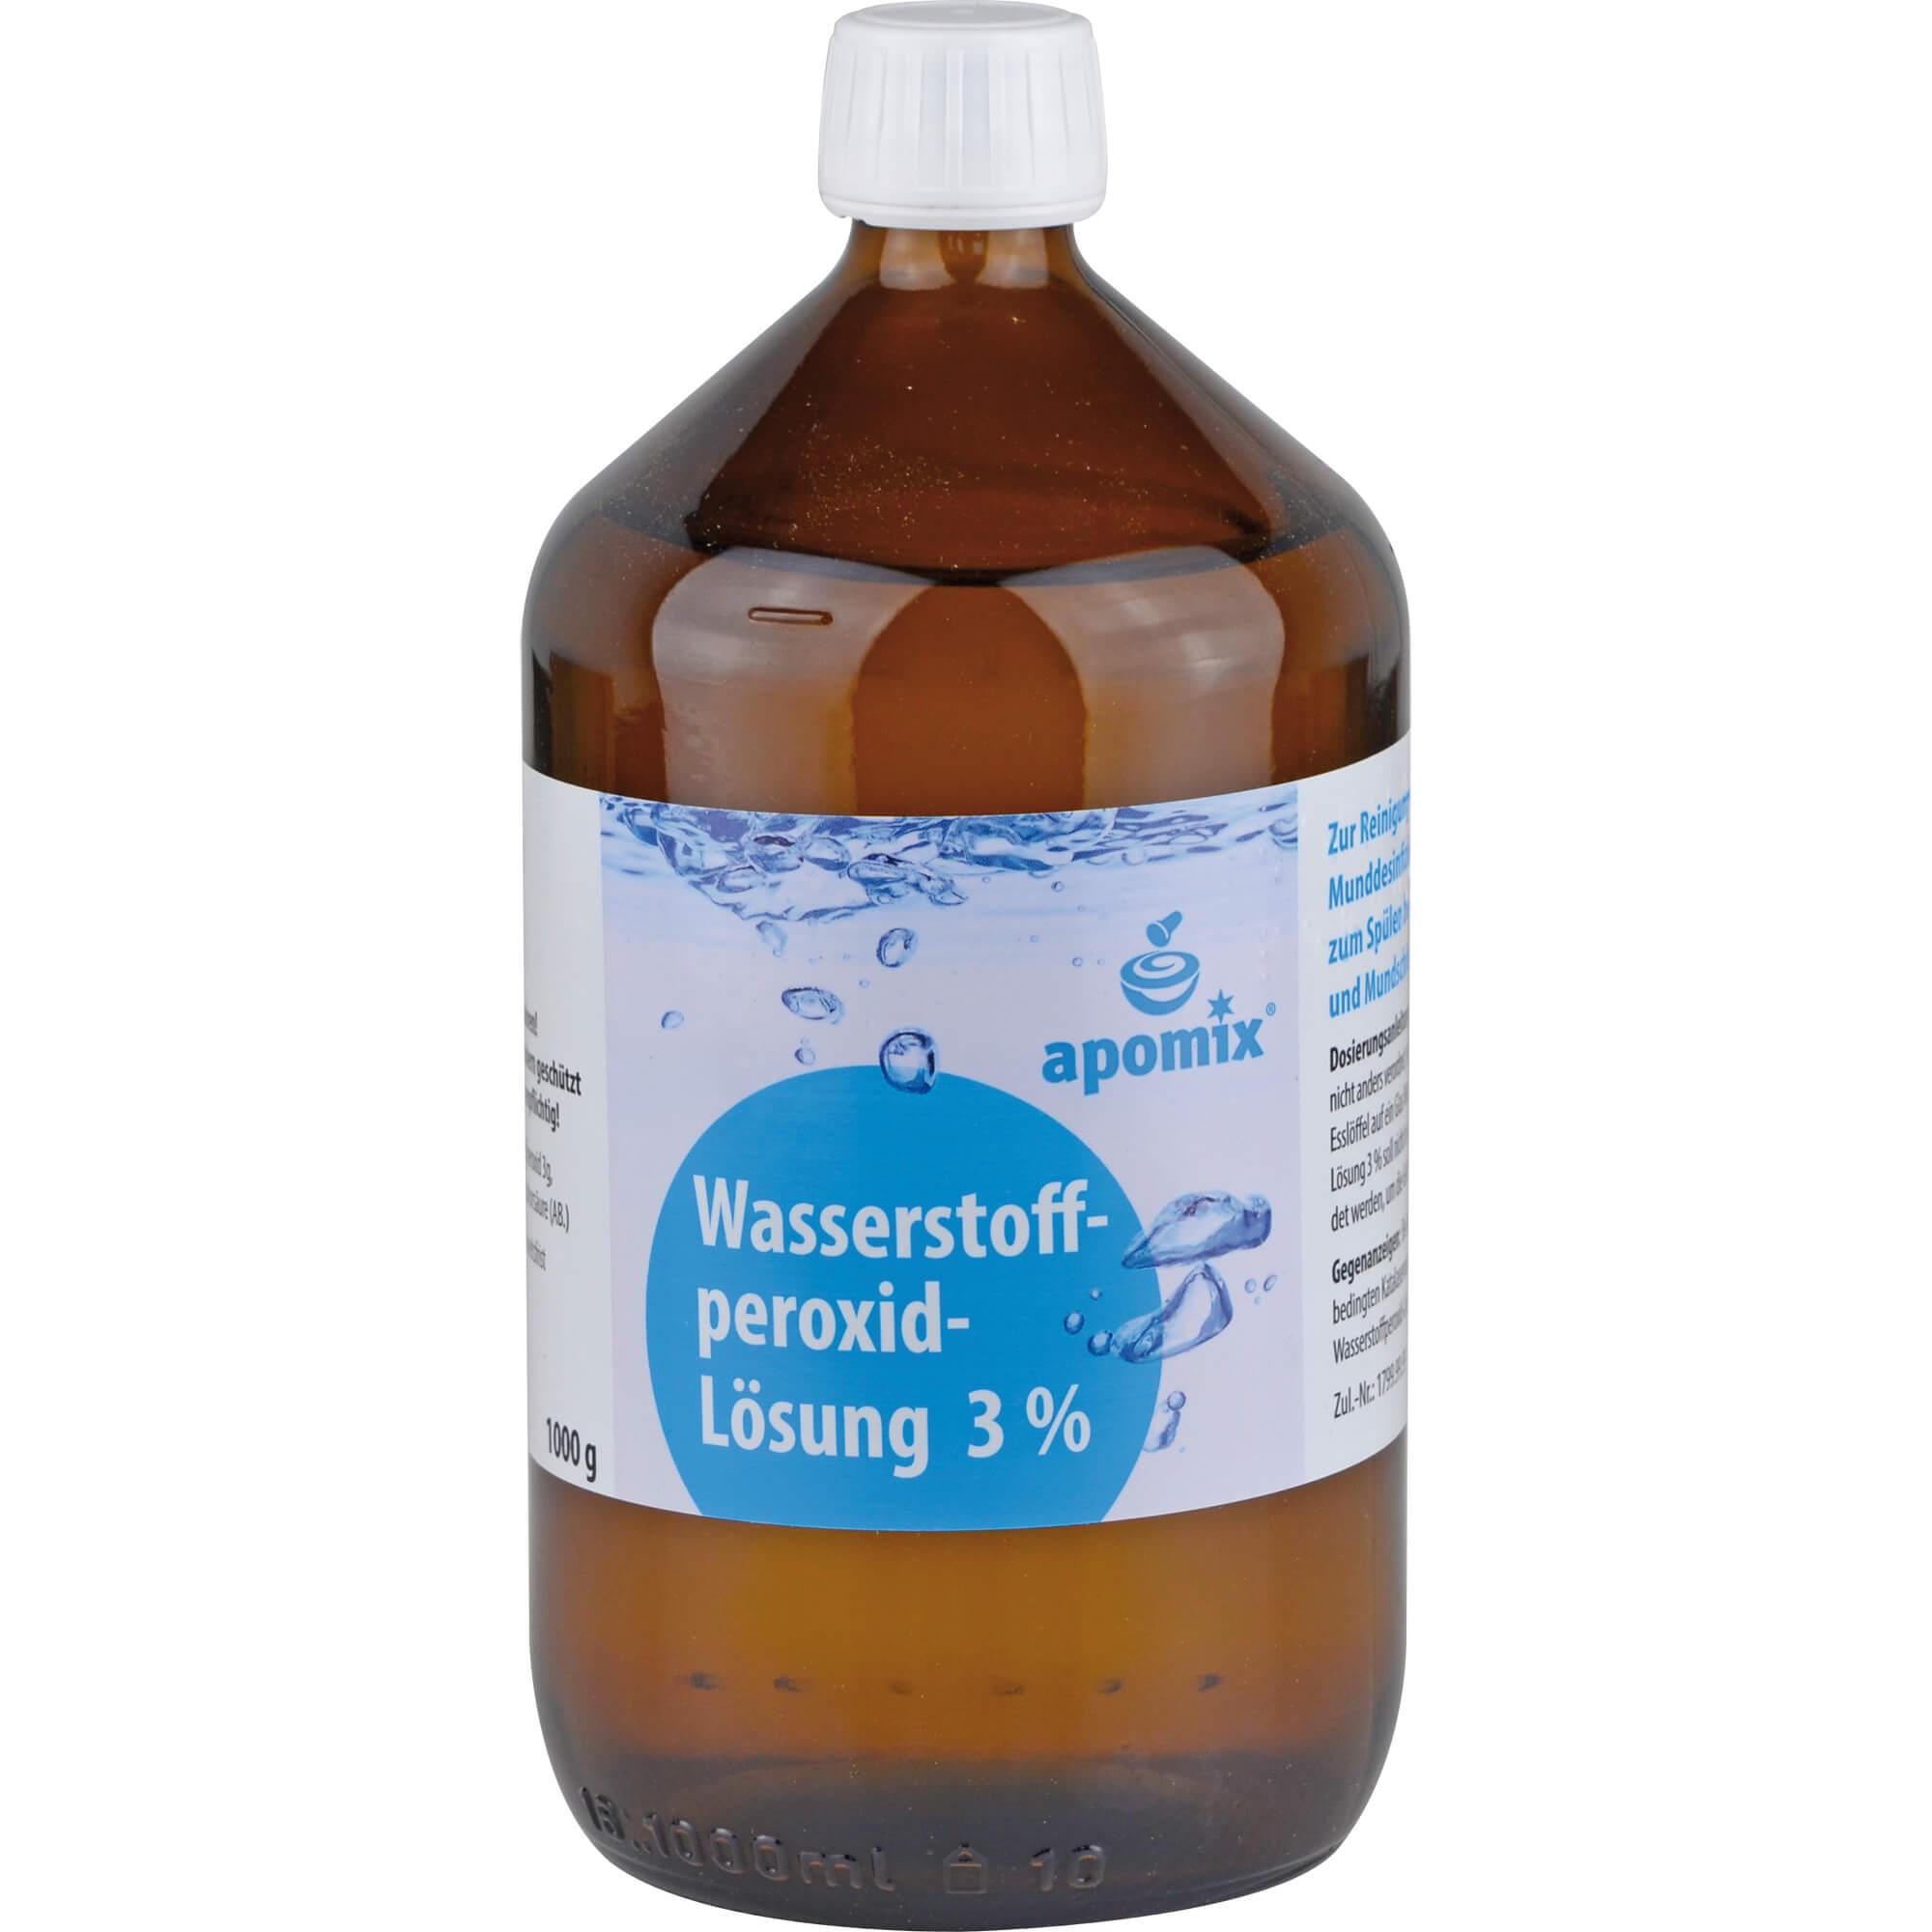 Wasserstoffperoxid 3% DAB 10 Lösung